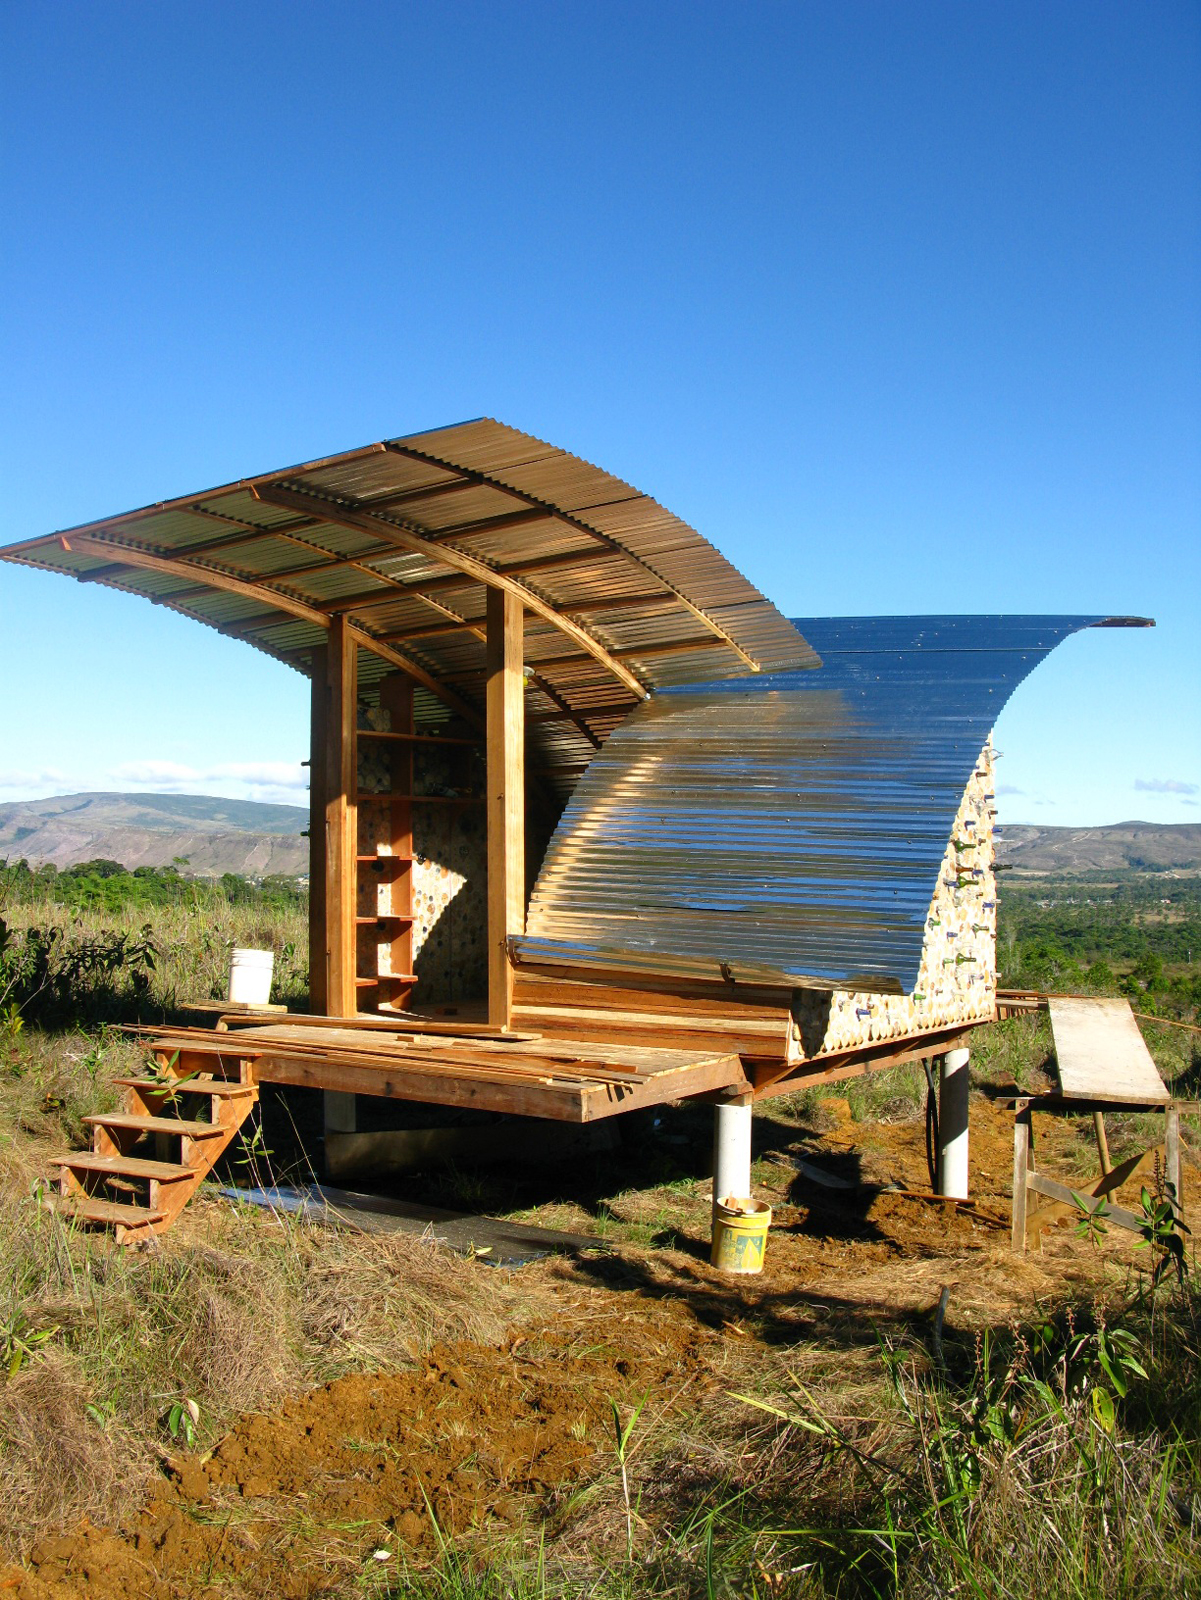 Corrugated metal dwelling in Venezuela